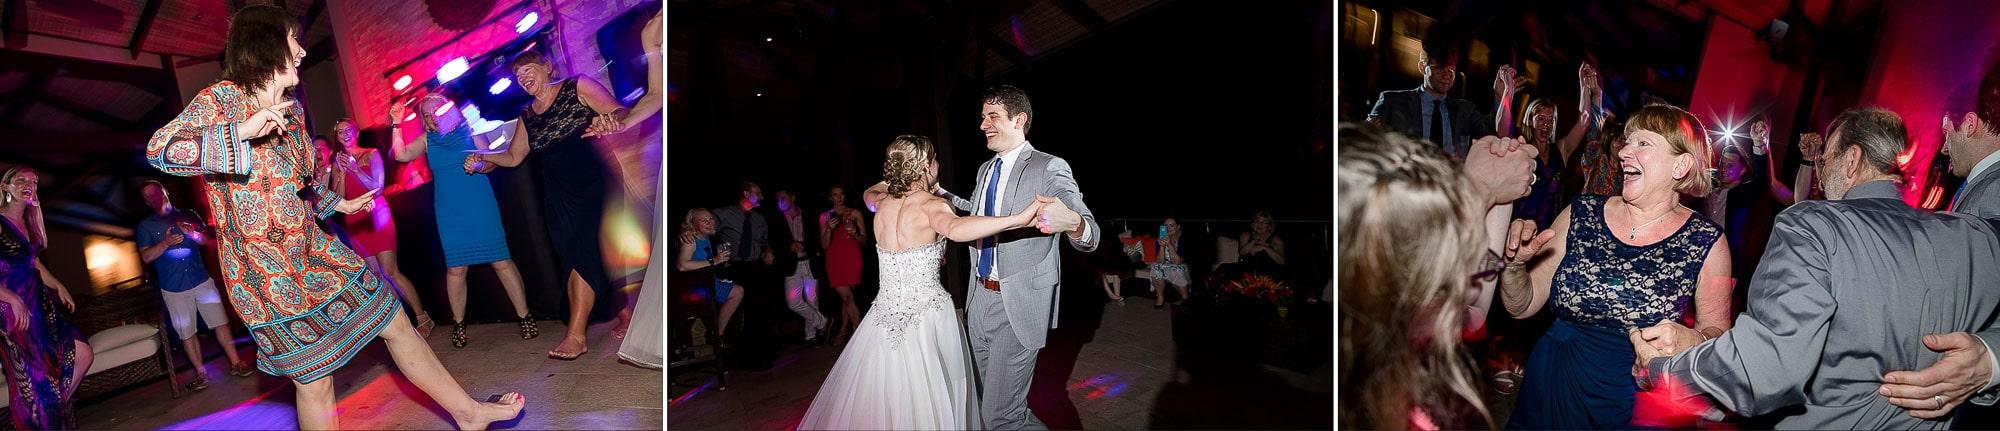 Having fun on the dance floor!